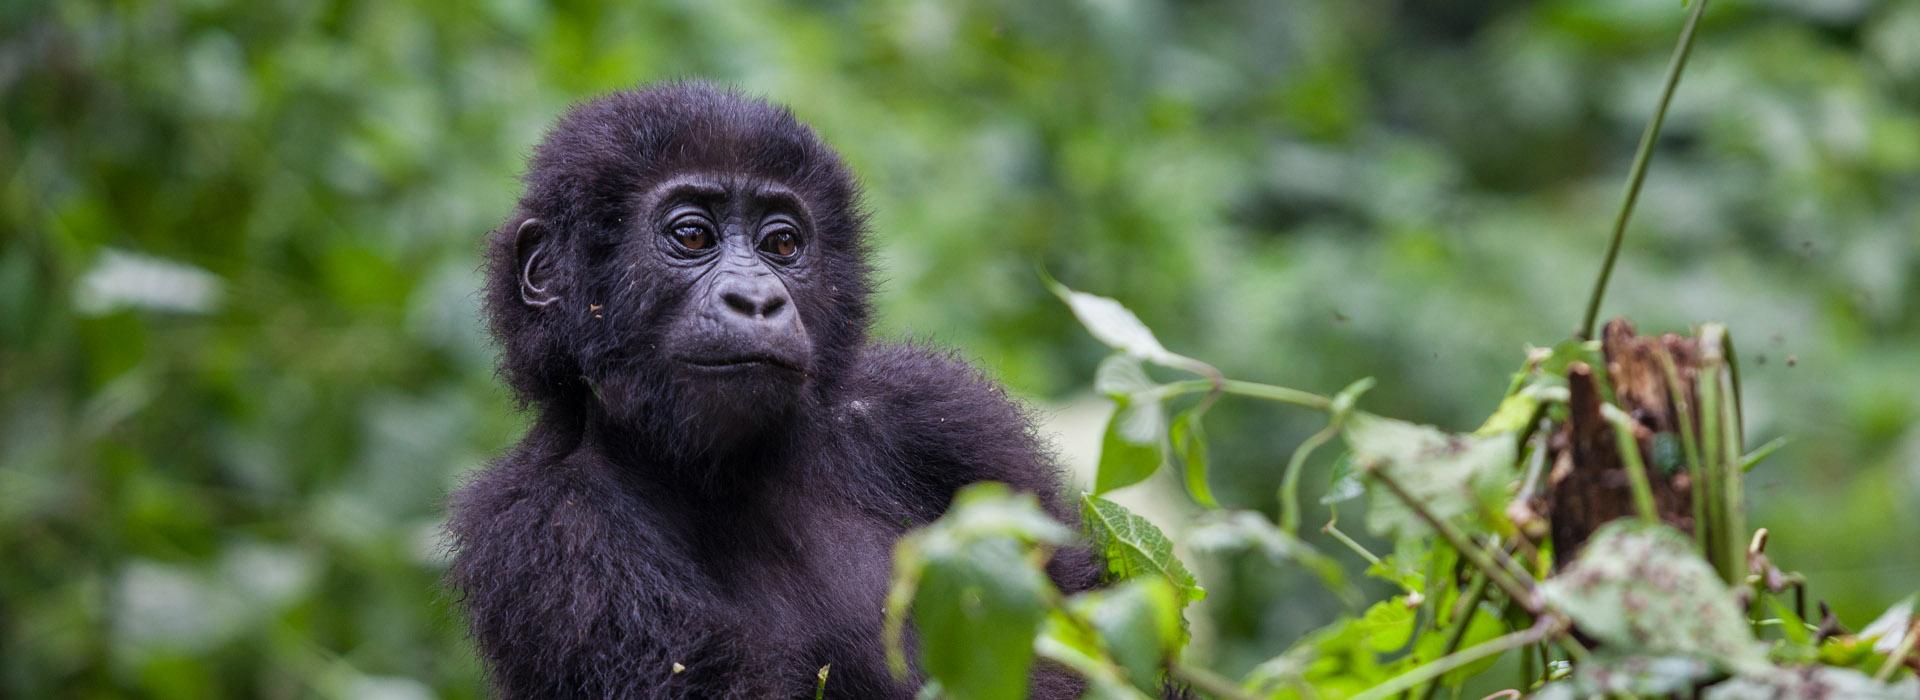 4 DAYS UGANDA GORILLA TREKKING - African Adventure Specialists